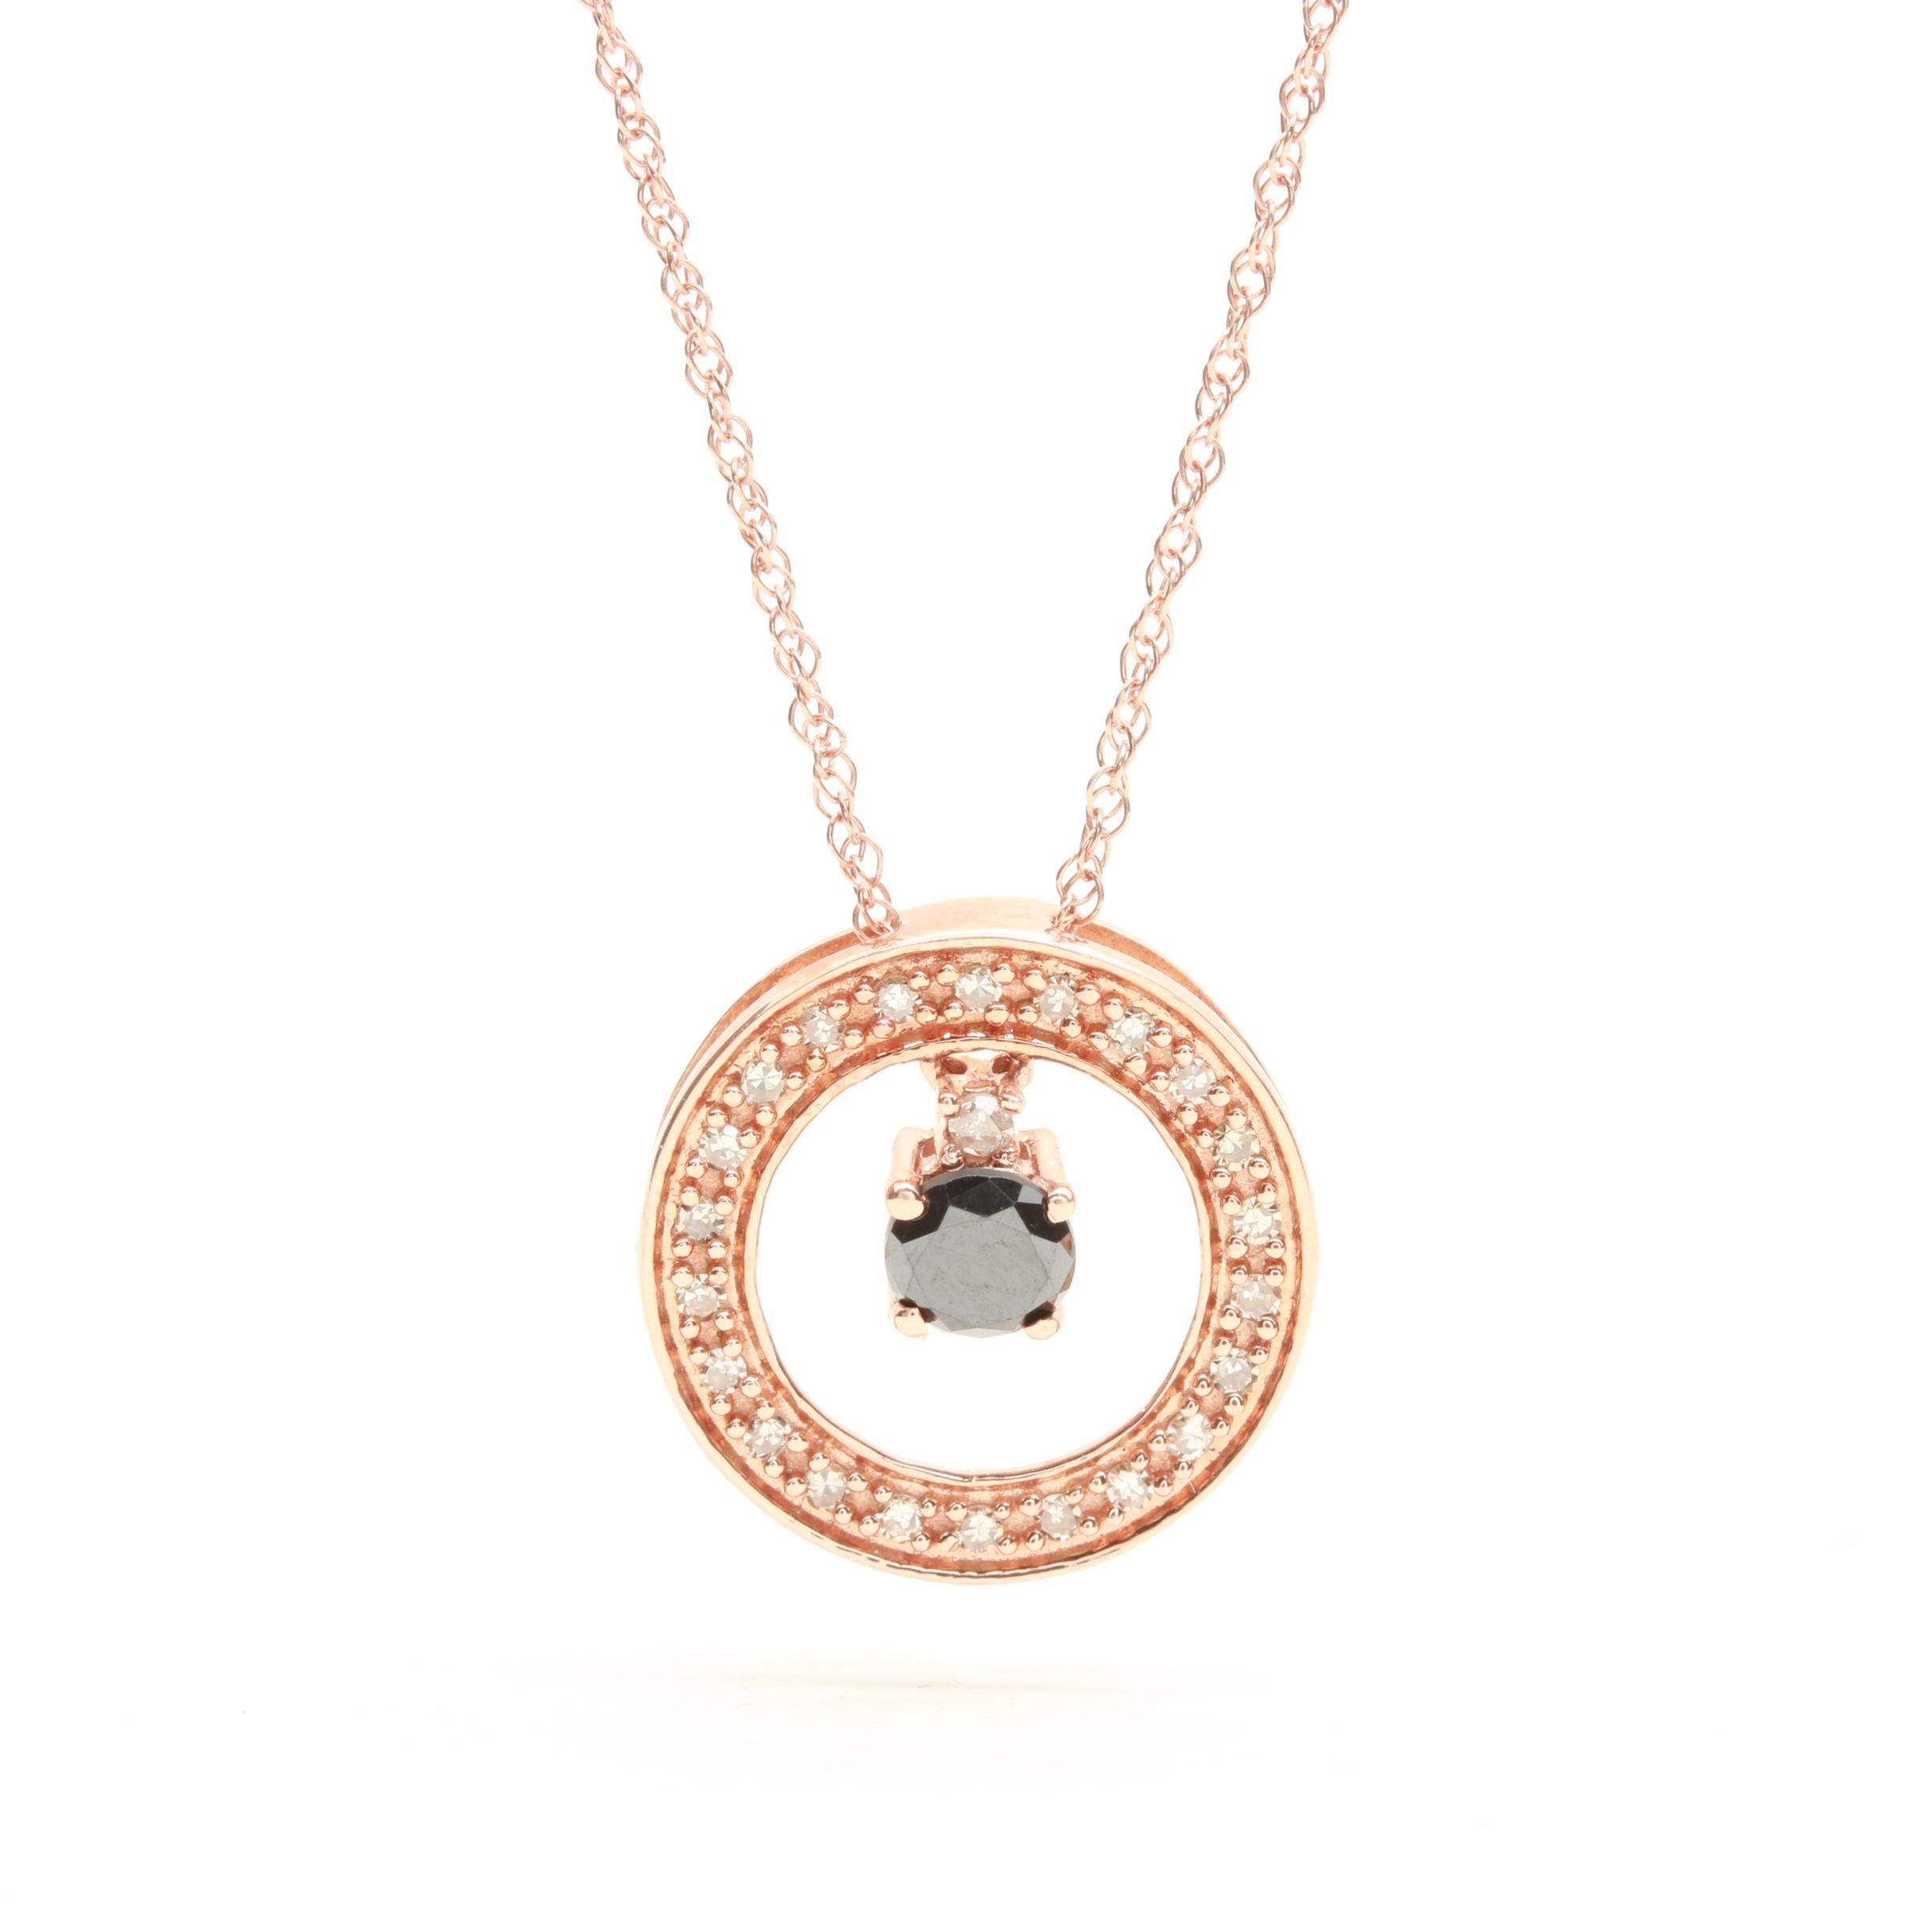 10K Rose Gold Black Moissanite and Diamond Necklace